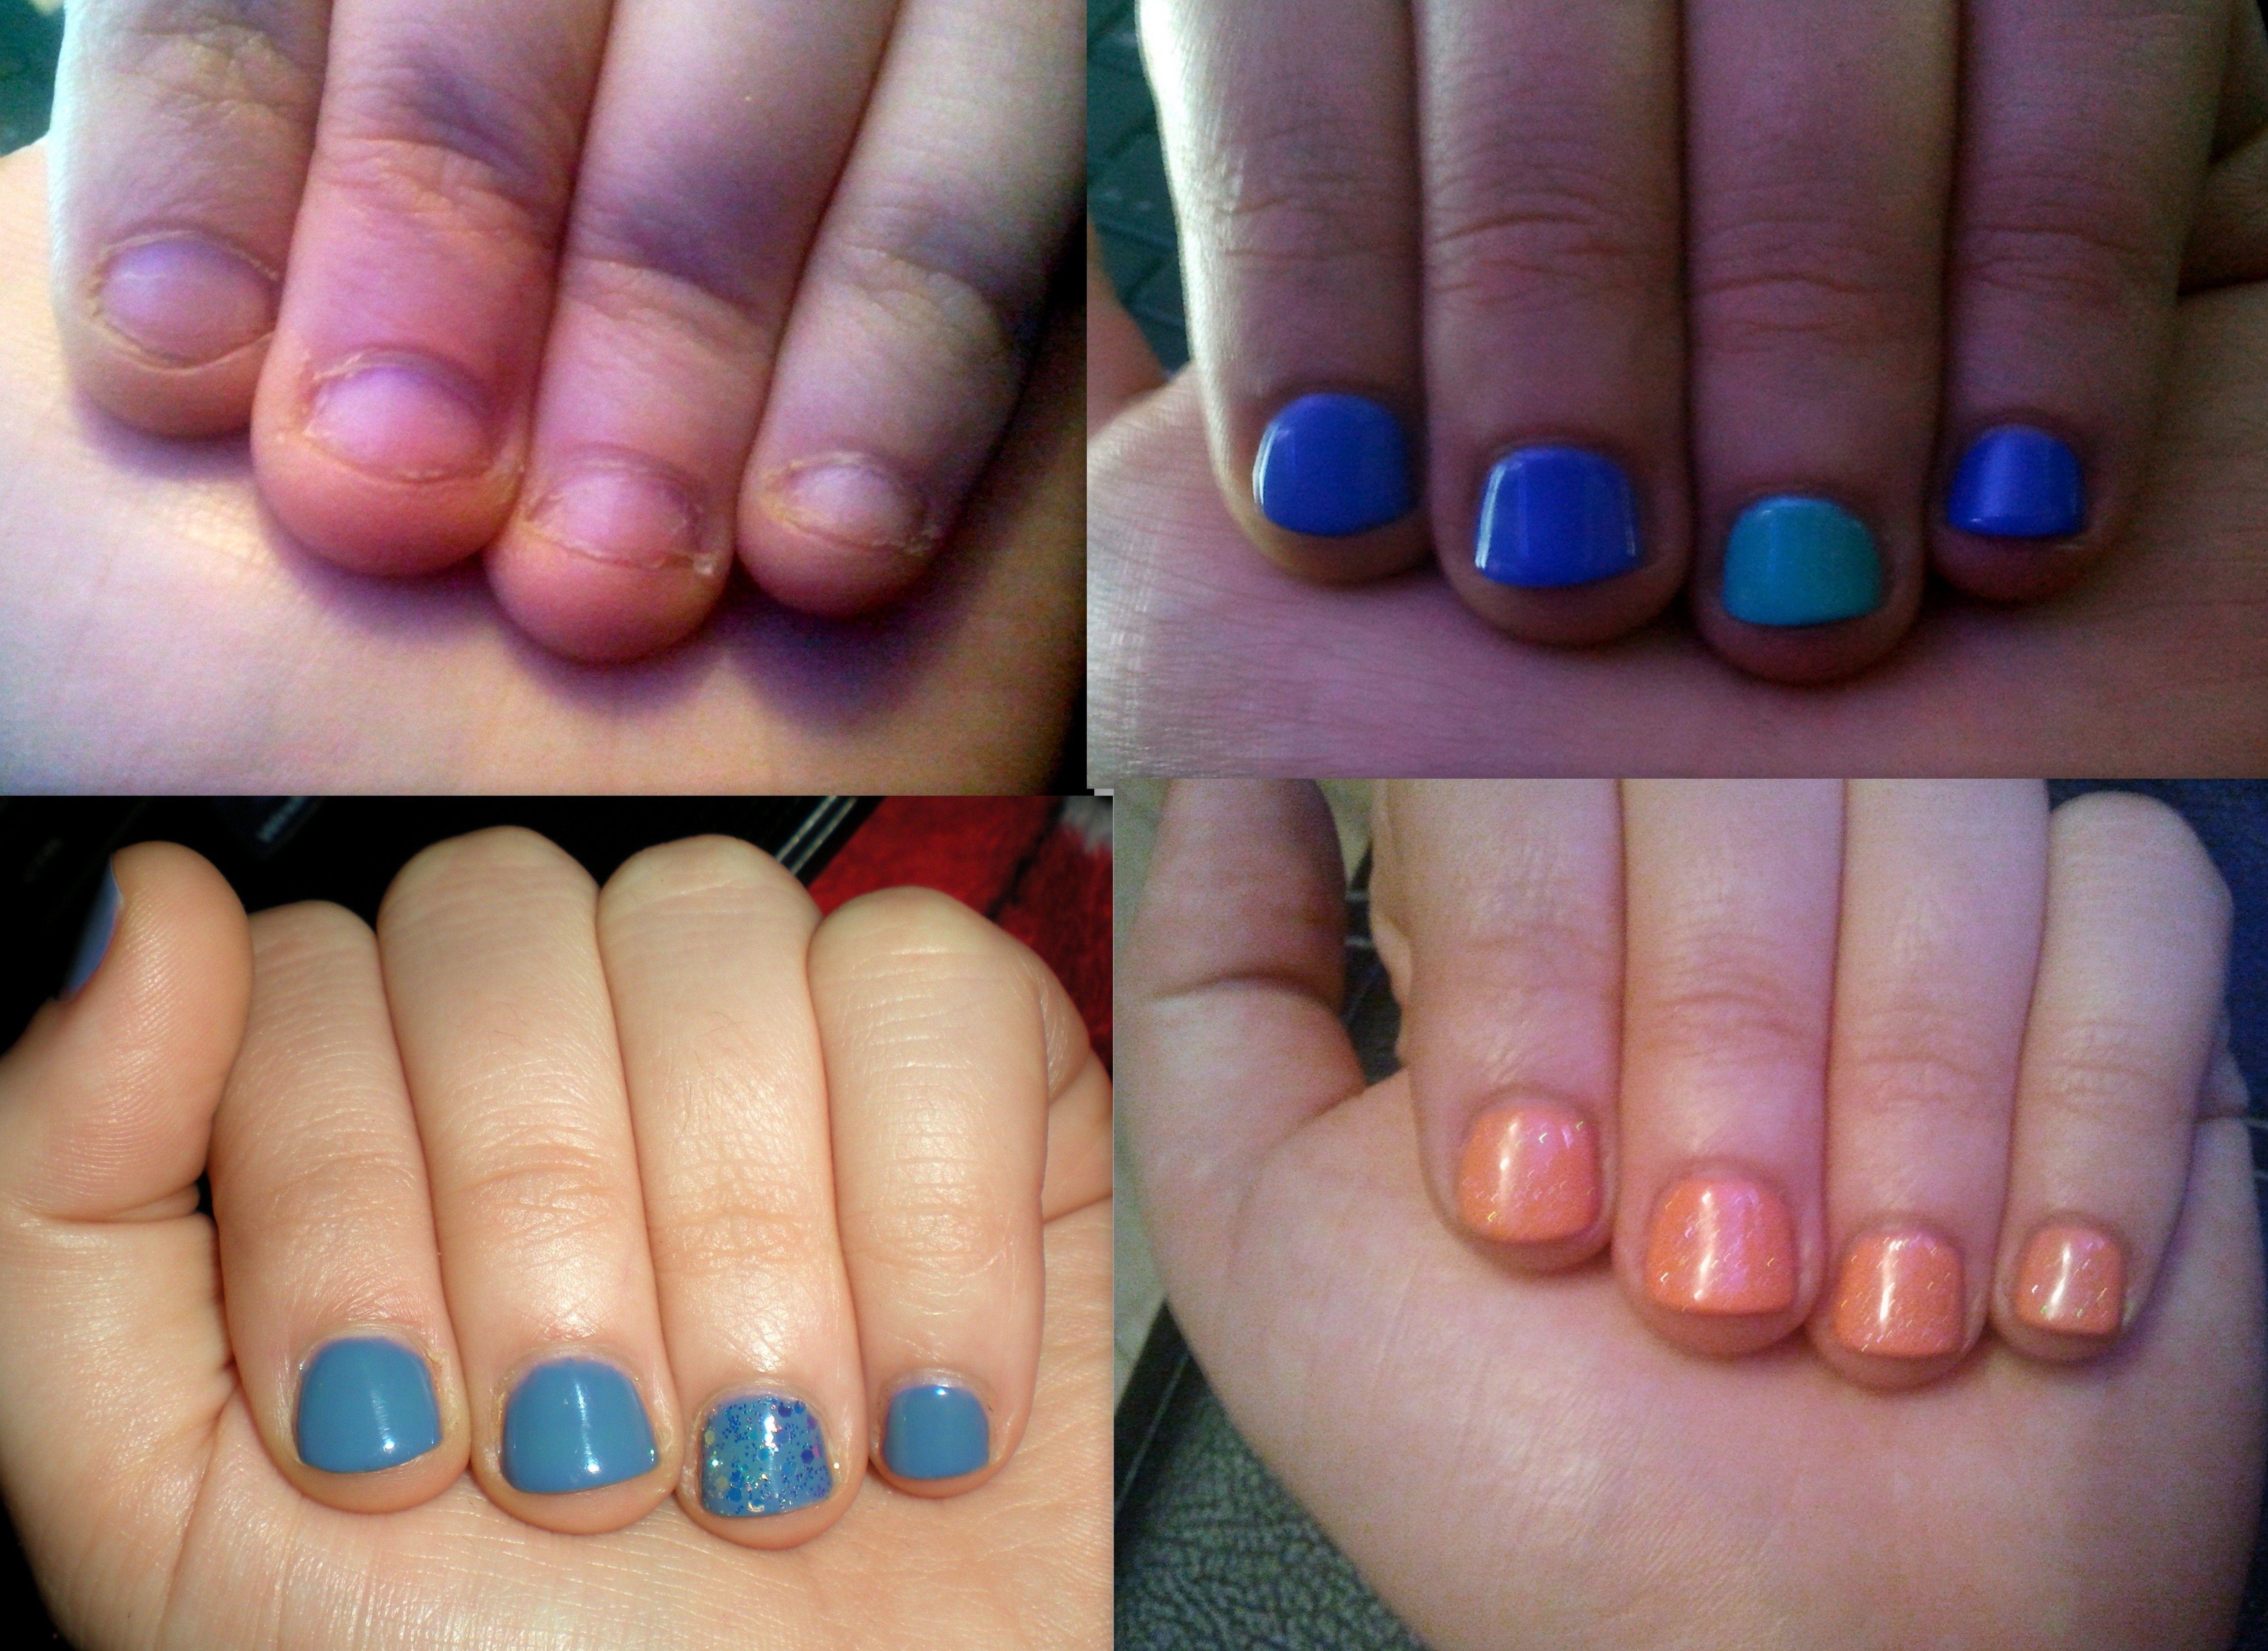 Bitten nails grown using Gelish Gel Polish over 7 weeks | Nail ...